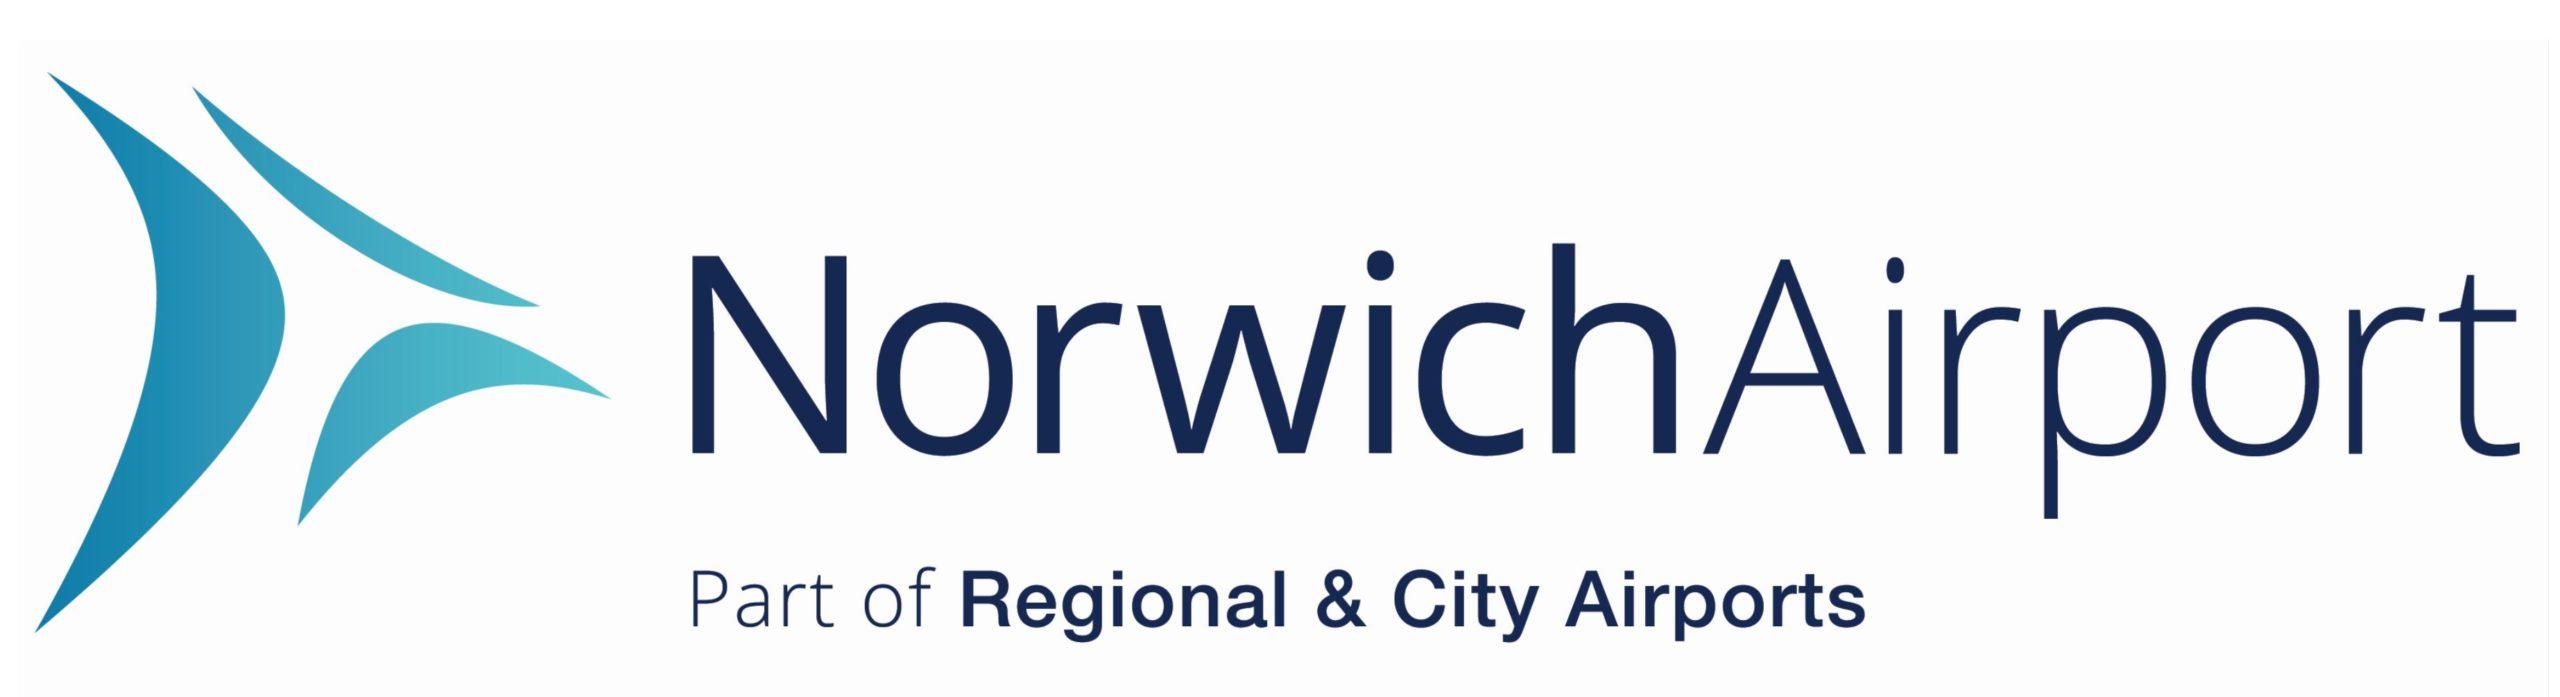 Norwich Airport Ltd